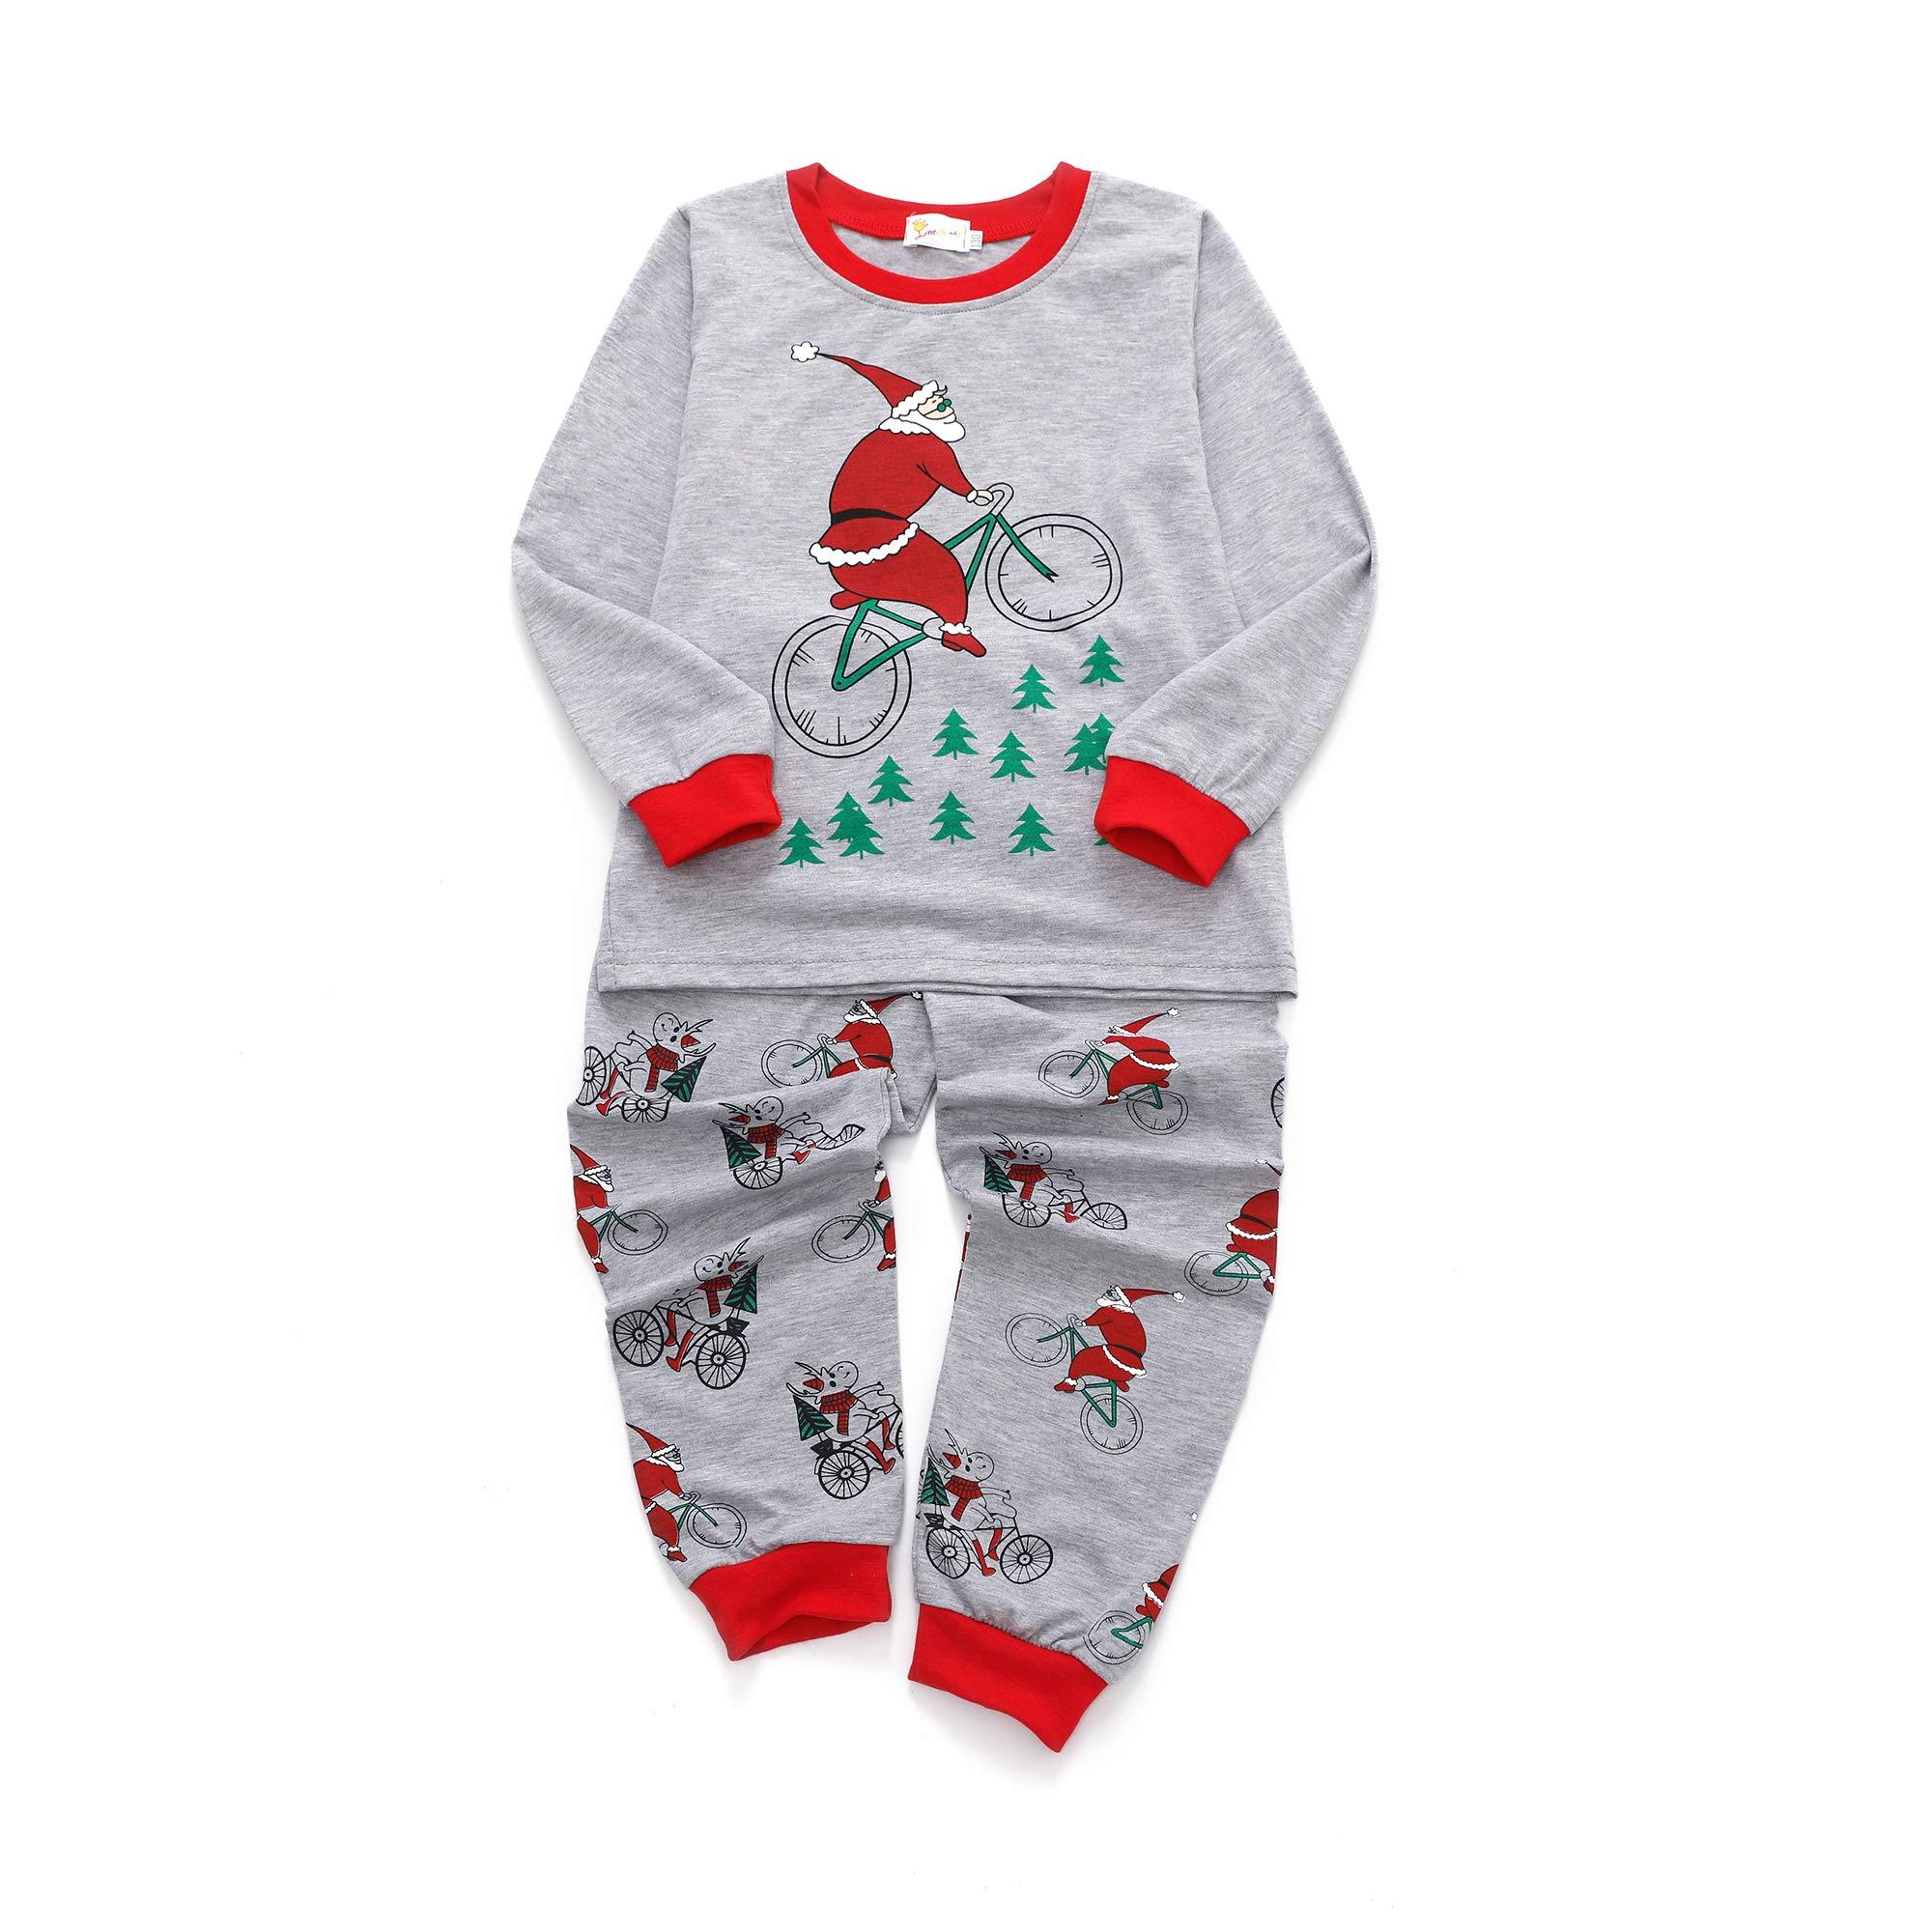 Tarkis Boys Pyjamas Set Cartoon Printed Long Sleeve Cotton PJS Sleepwear for Kids 2 to 7 Years Old (3-4 Years, 3-Santa Claus)